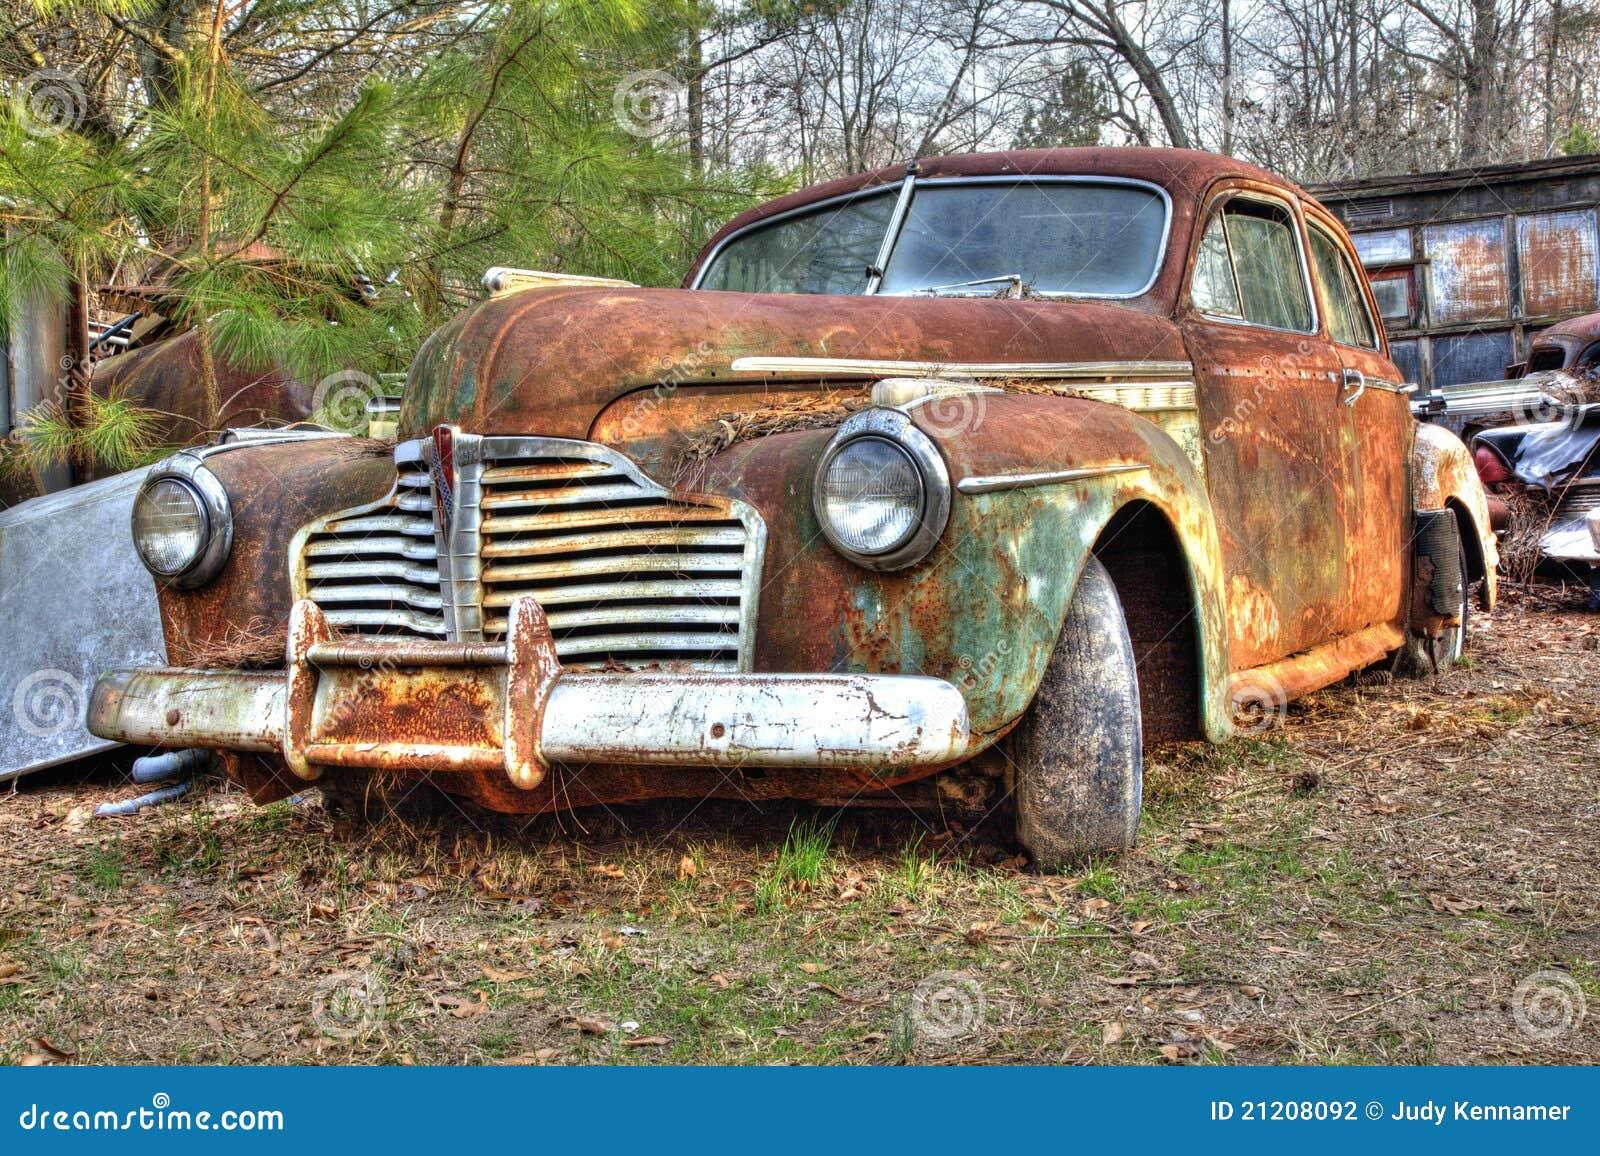 Junkyard Vehicle stock photo. Image of american, abandoned - 21208092